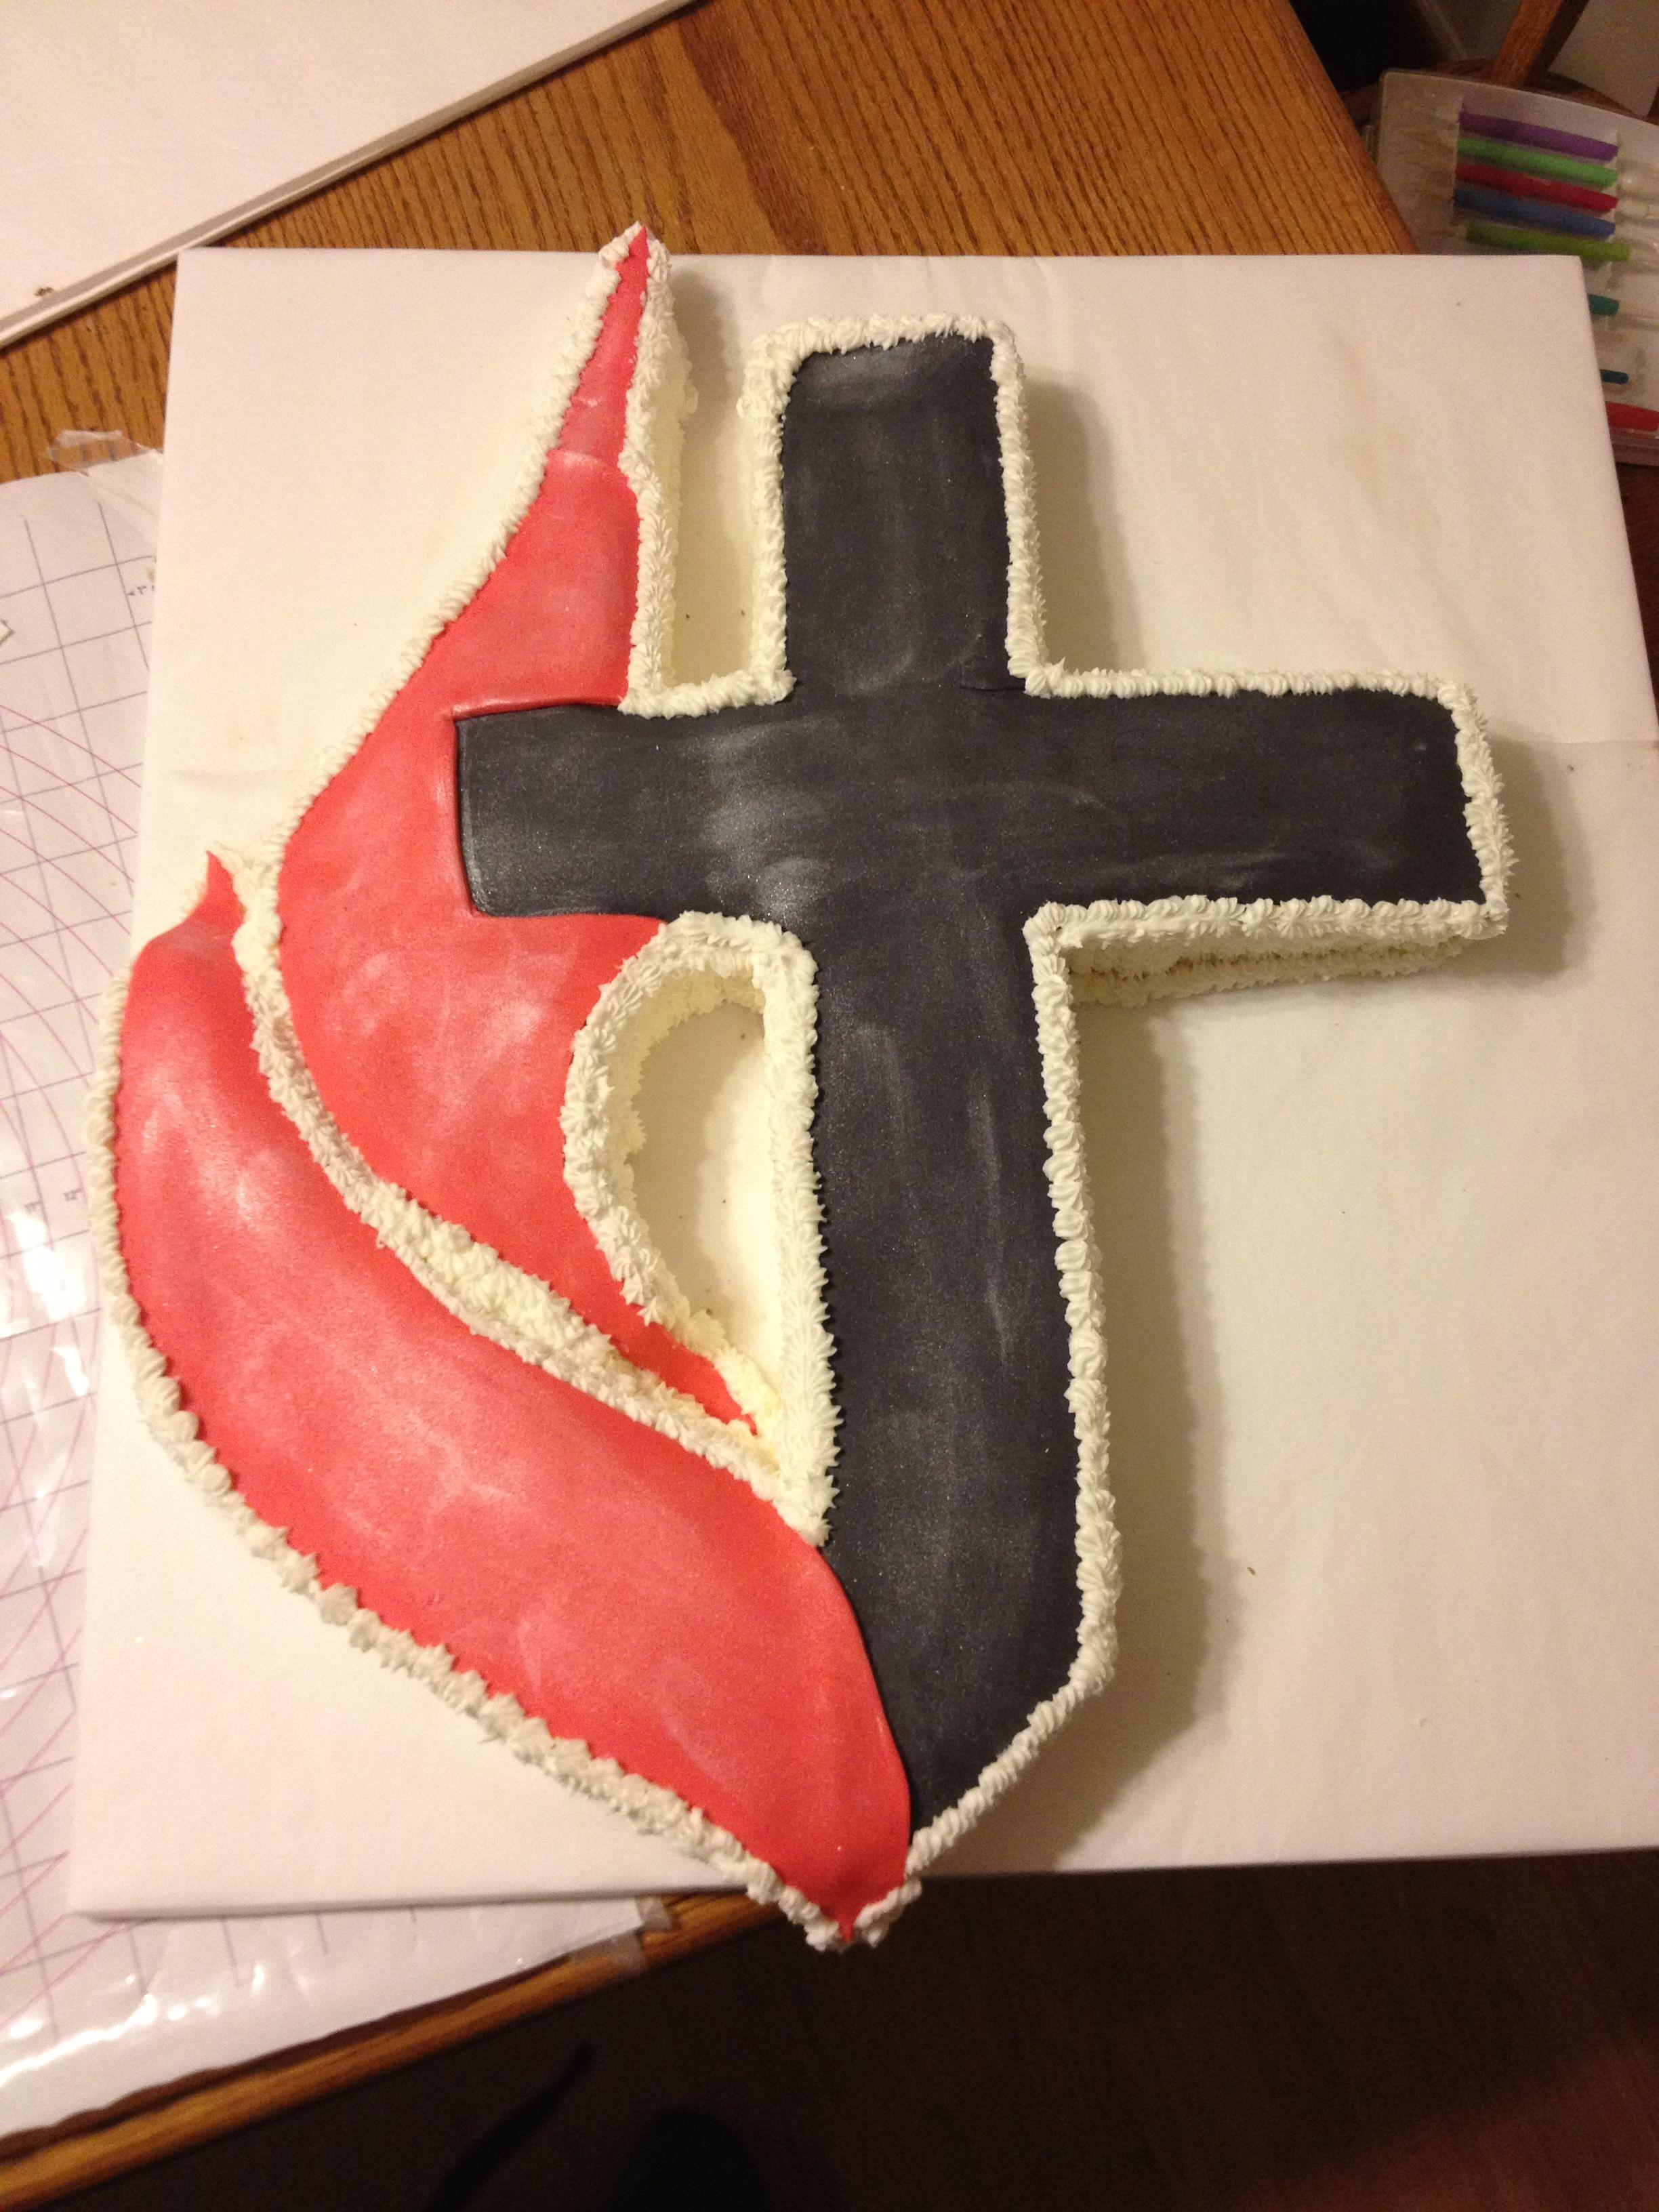 United methodist church cross and flame cake cakes with grace united methodist church cross and flame cake biocorpaavc Choice Image